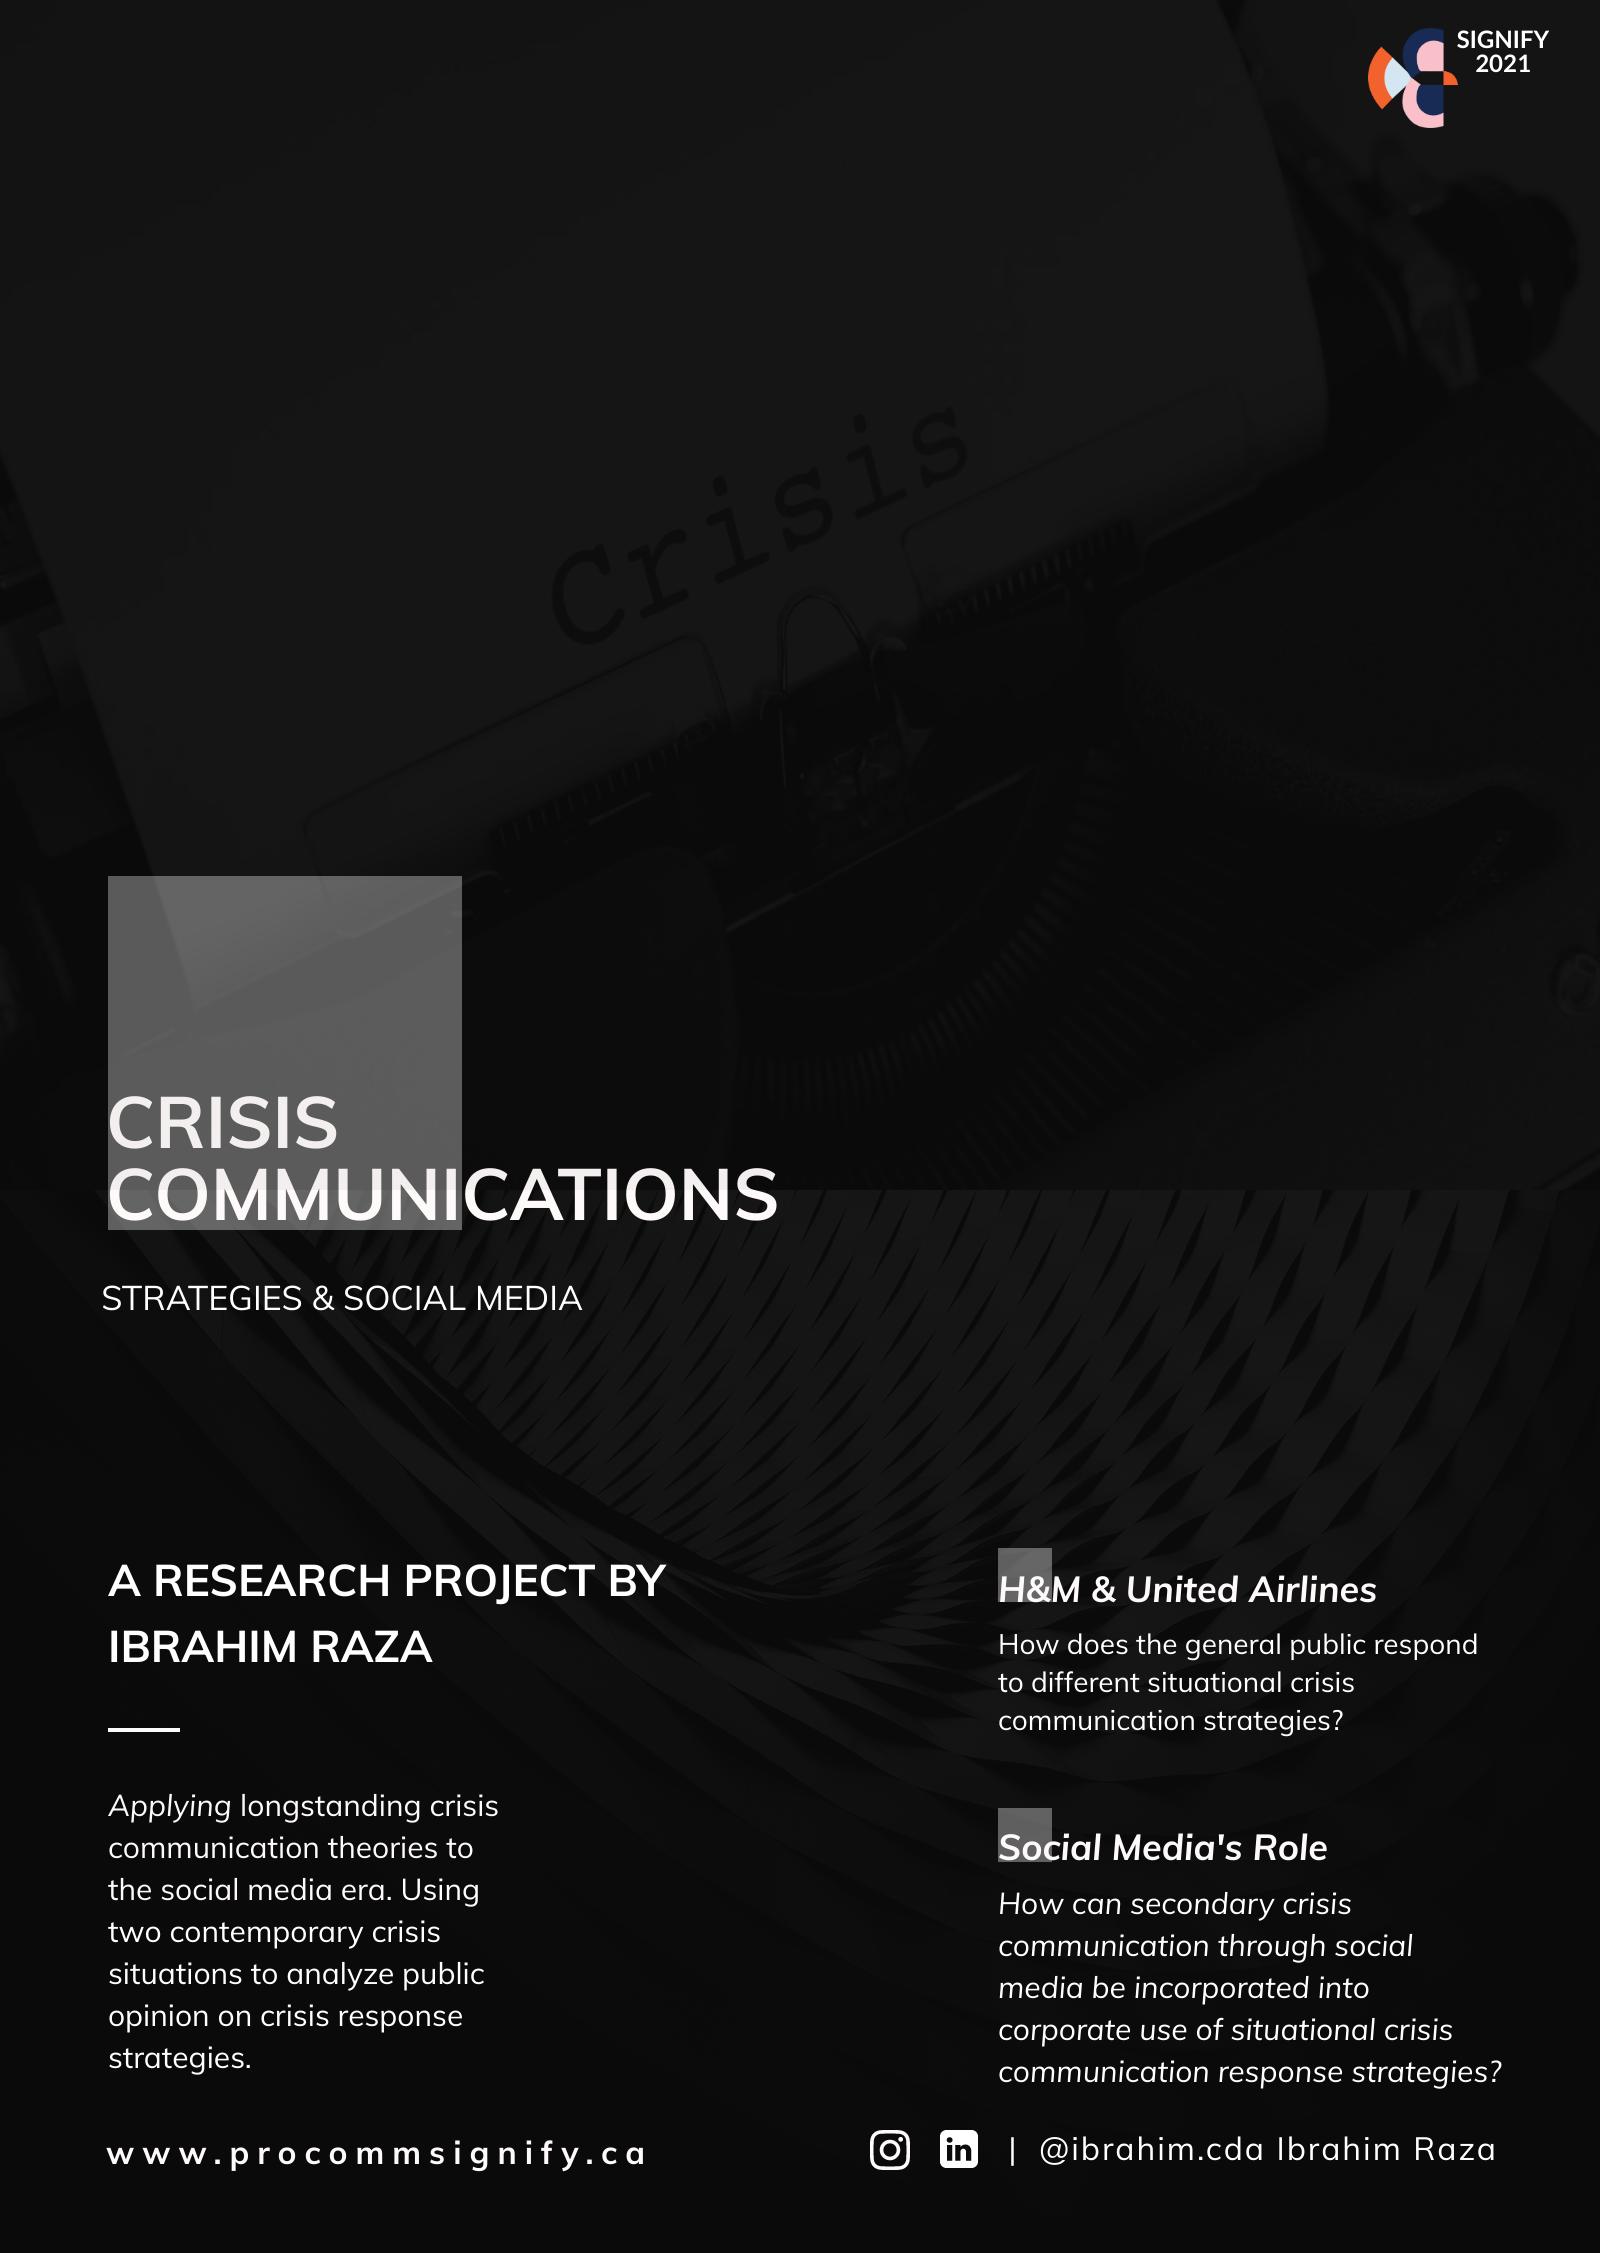 Crisis Communication Strategies & Social Media: An Application of Situational Crisis Communication Theory